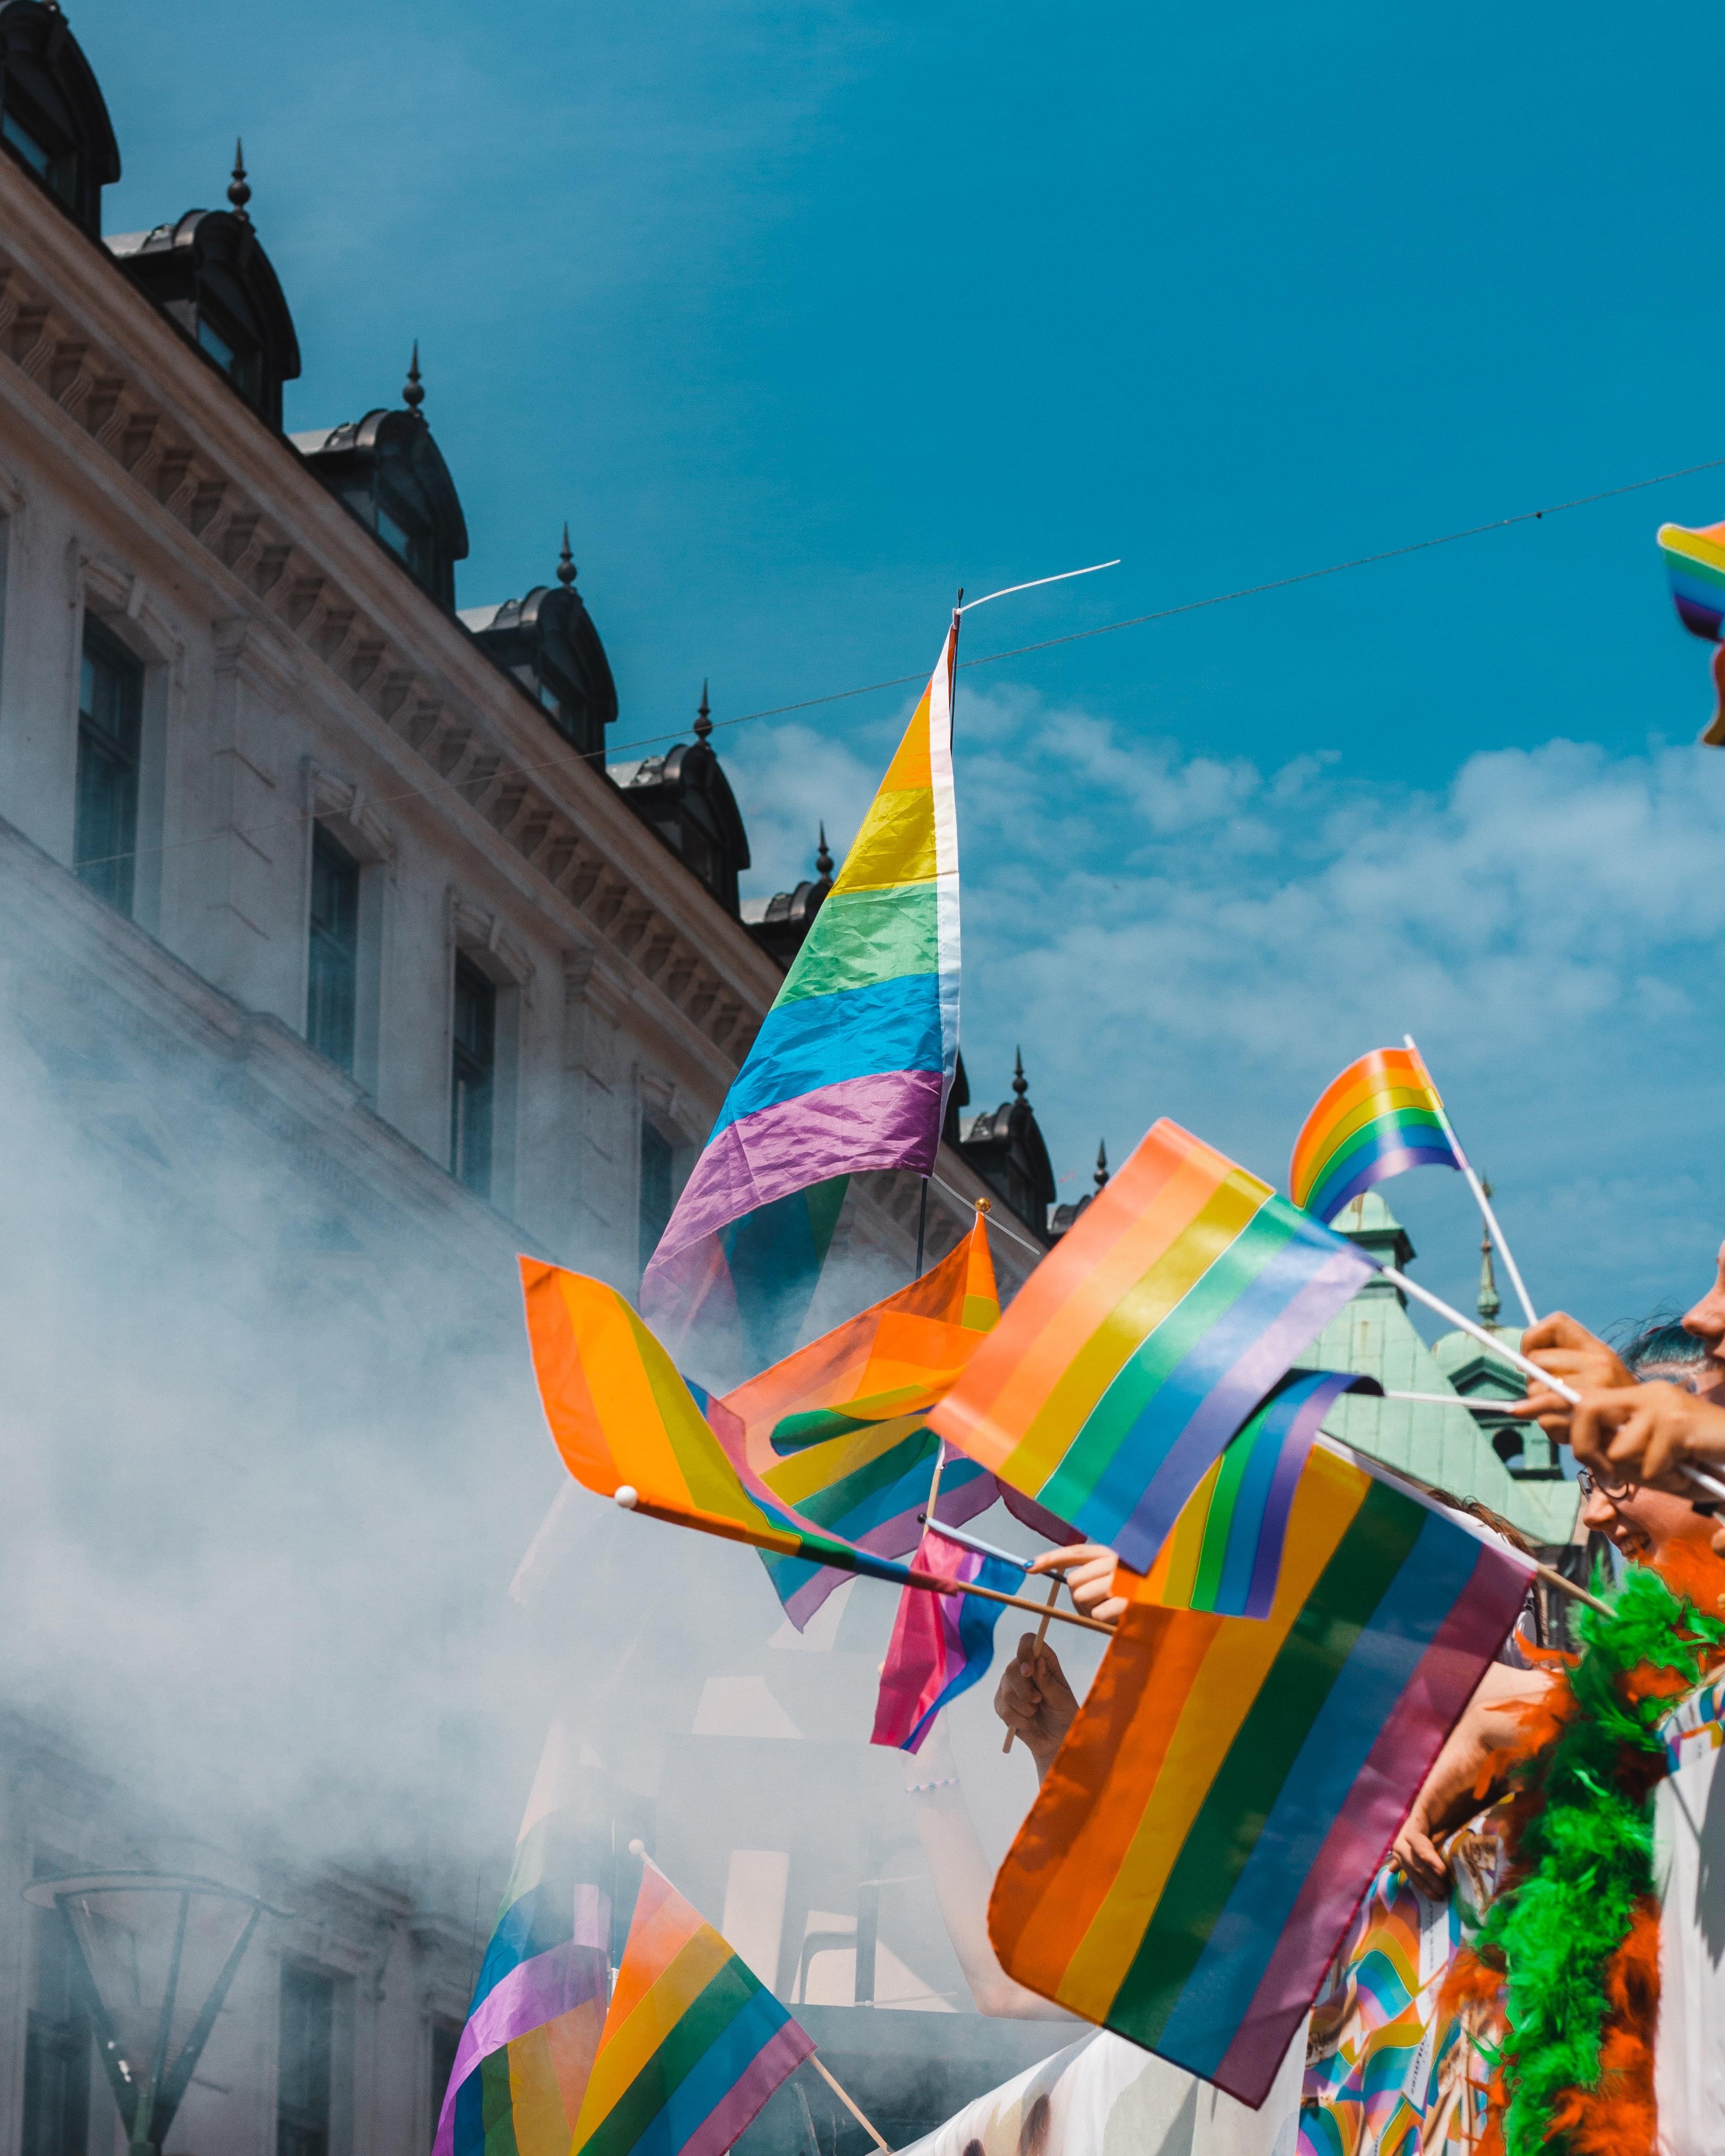 Raised rainbow pride flags. Photo courtesy of Teddy Osterblom on Unsplash.